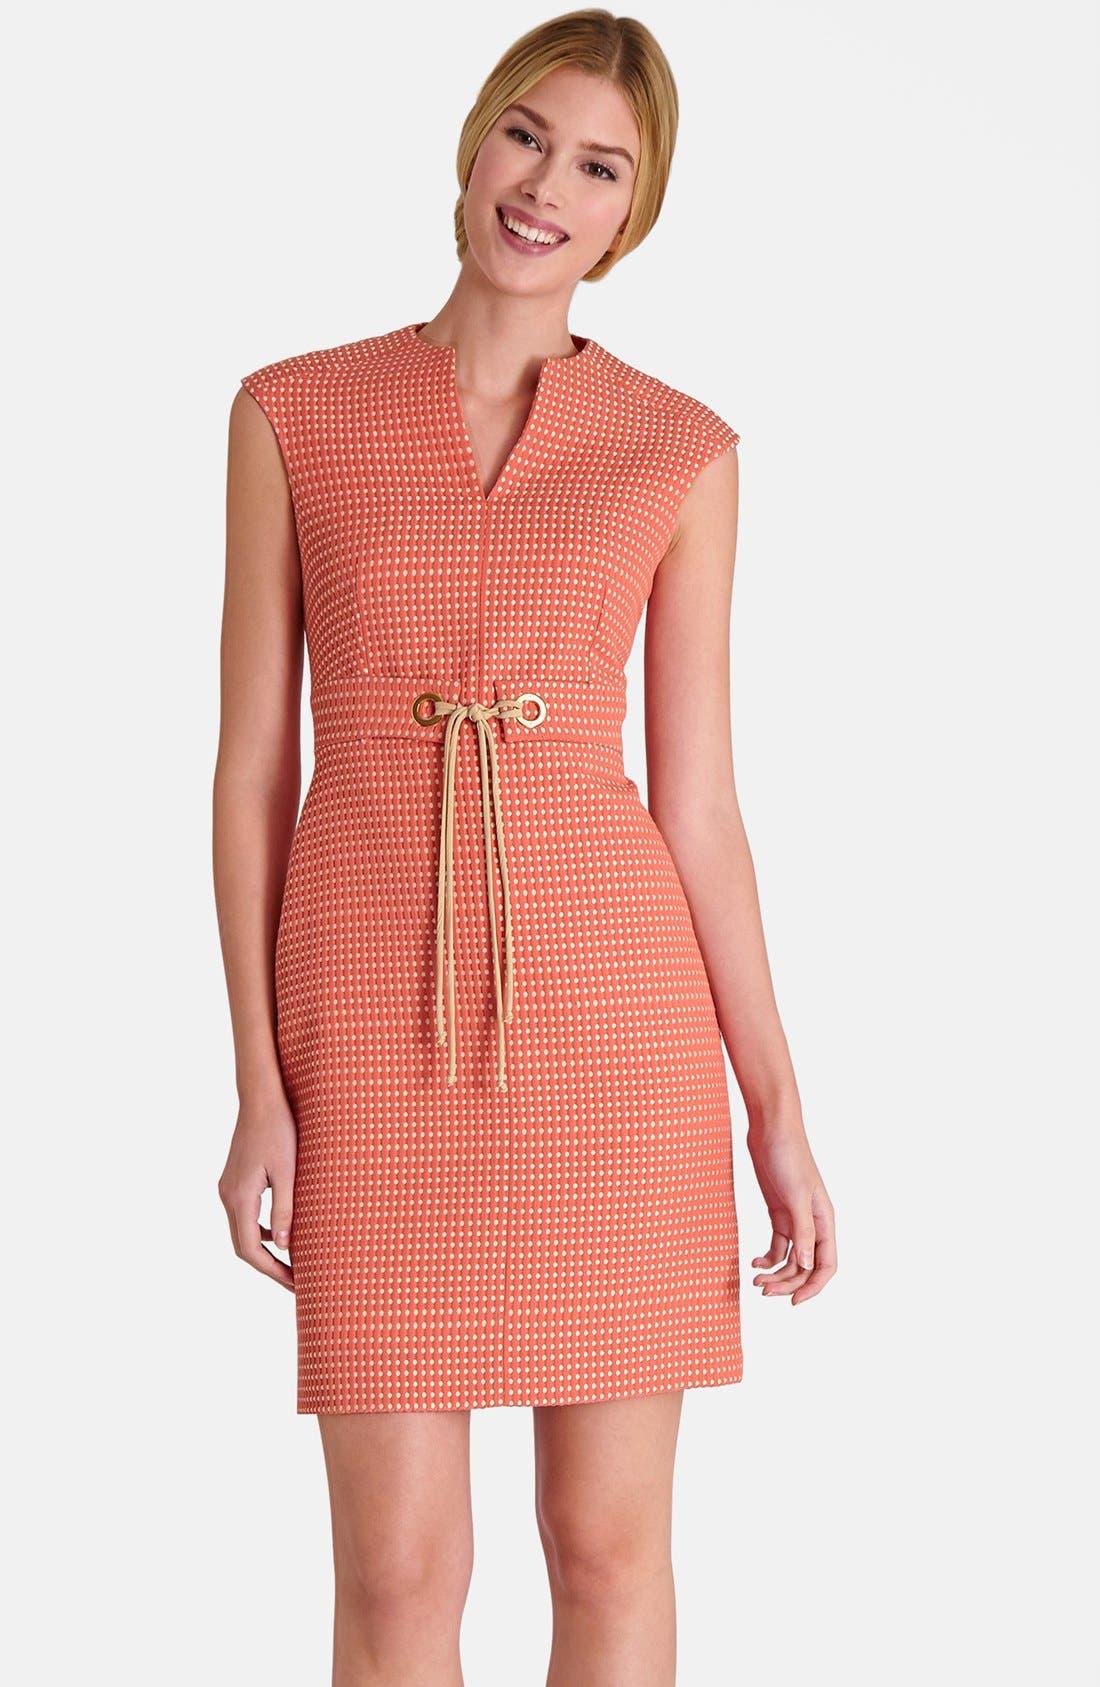 Alternate Image 1 Selected - Tahari Jacquard Sheath Dress (Petite)